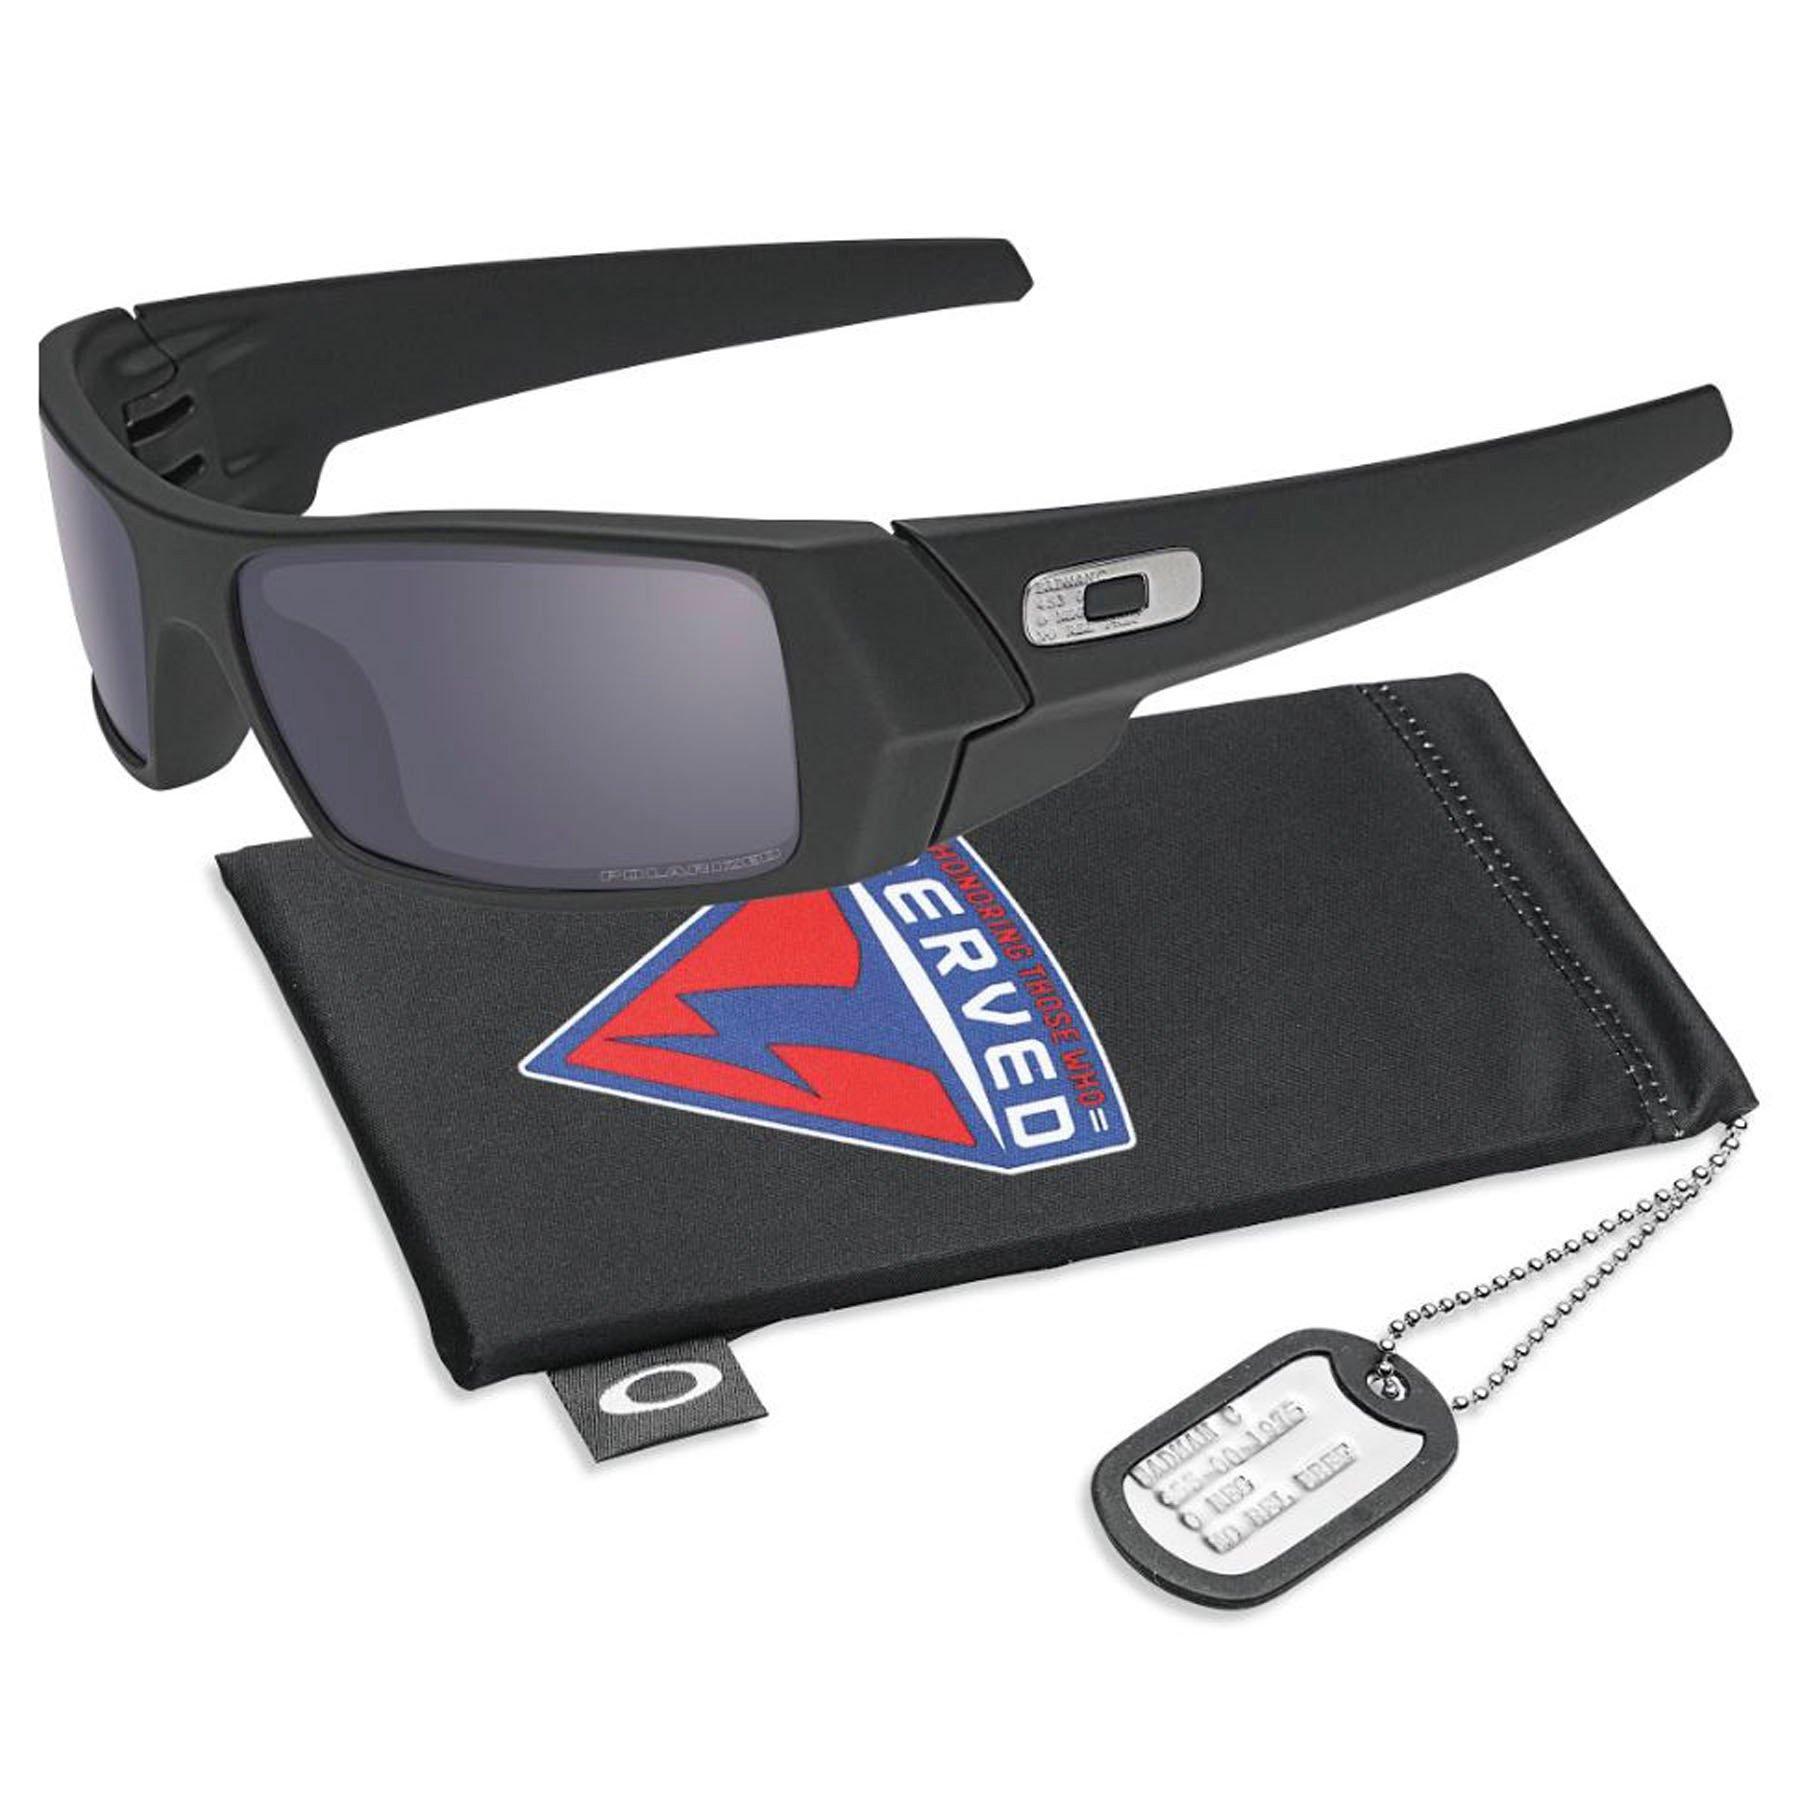 79a62bf6ebd79 where to buy oakley si gascan sunglasses 289b8 3e076